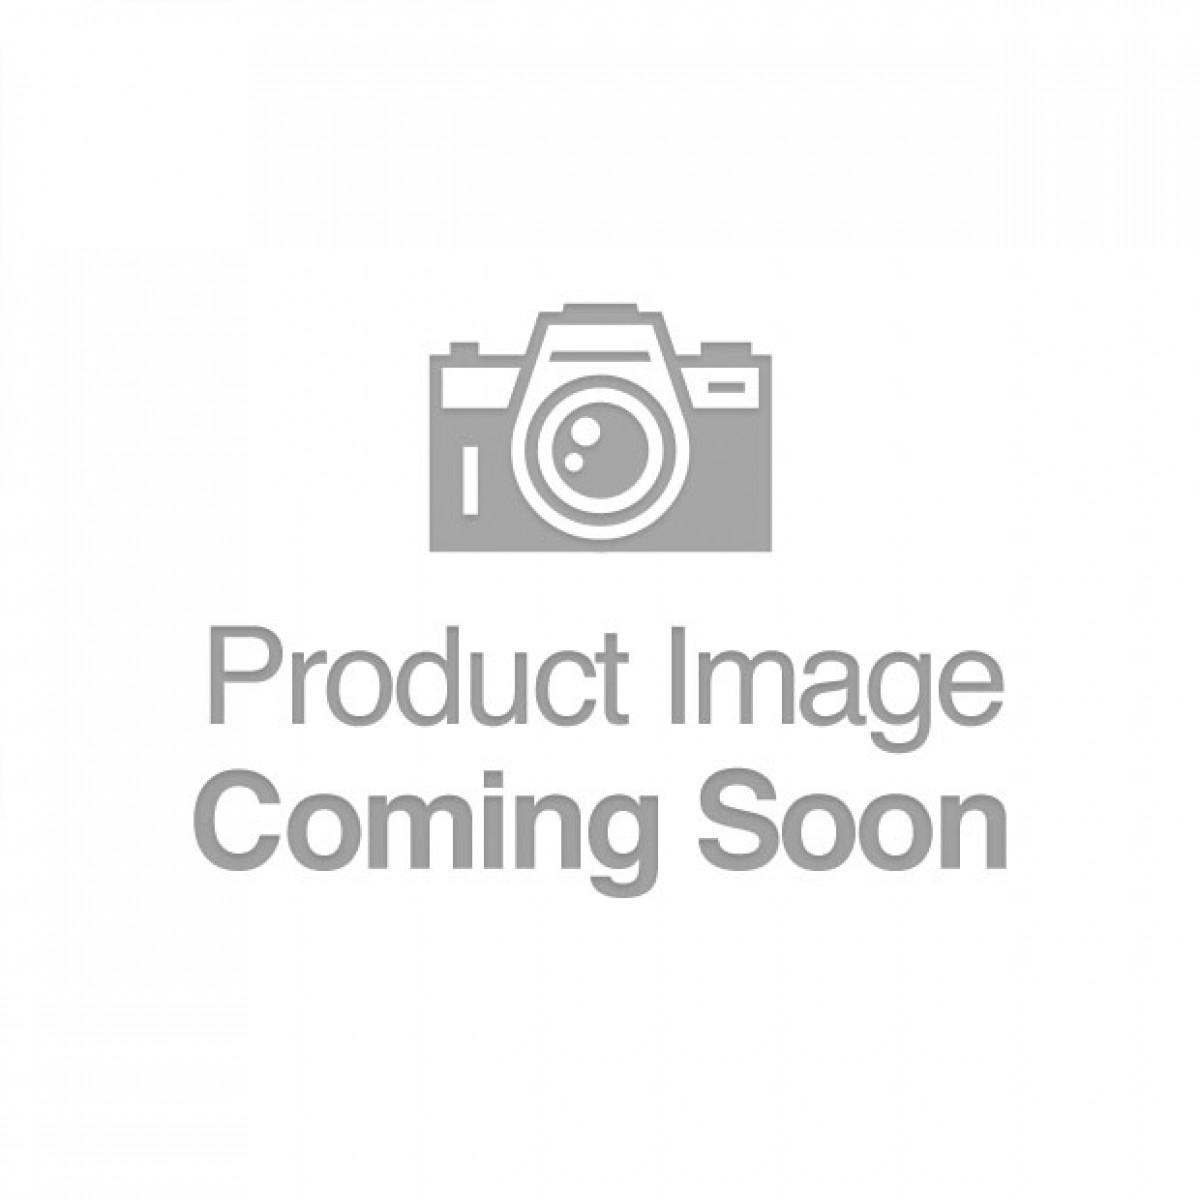 VeDO KIWI Rechargeable Instertable Bullet - Deep Purple